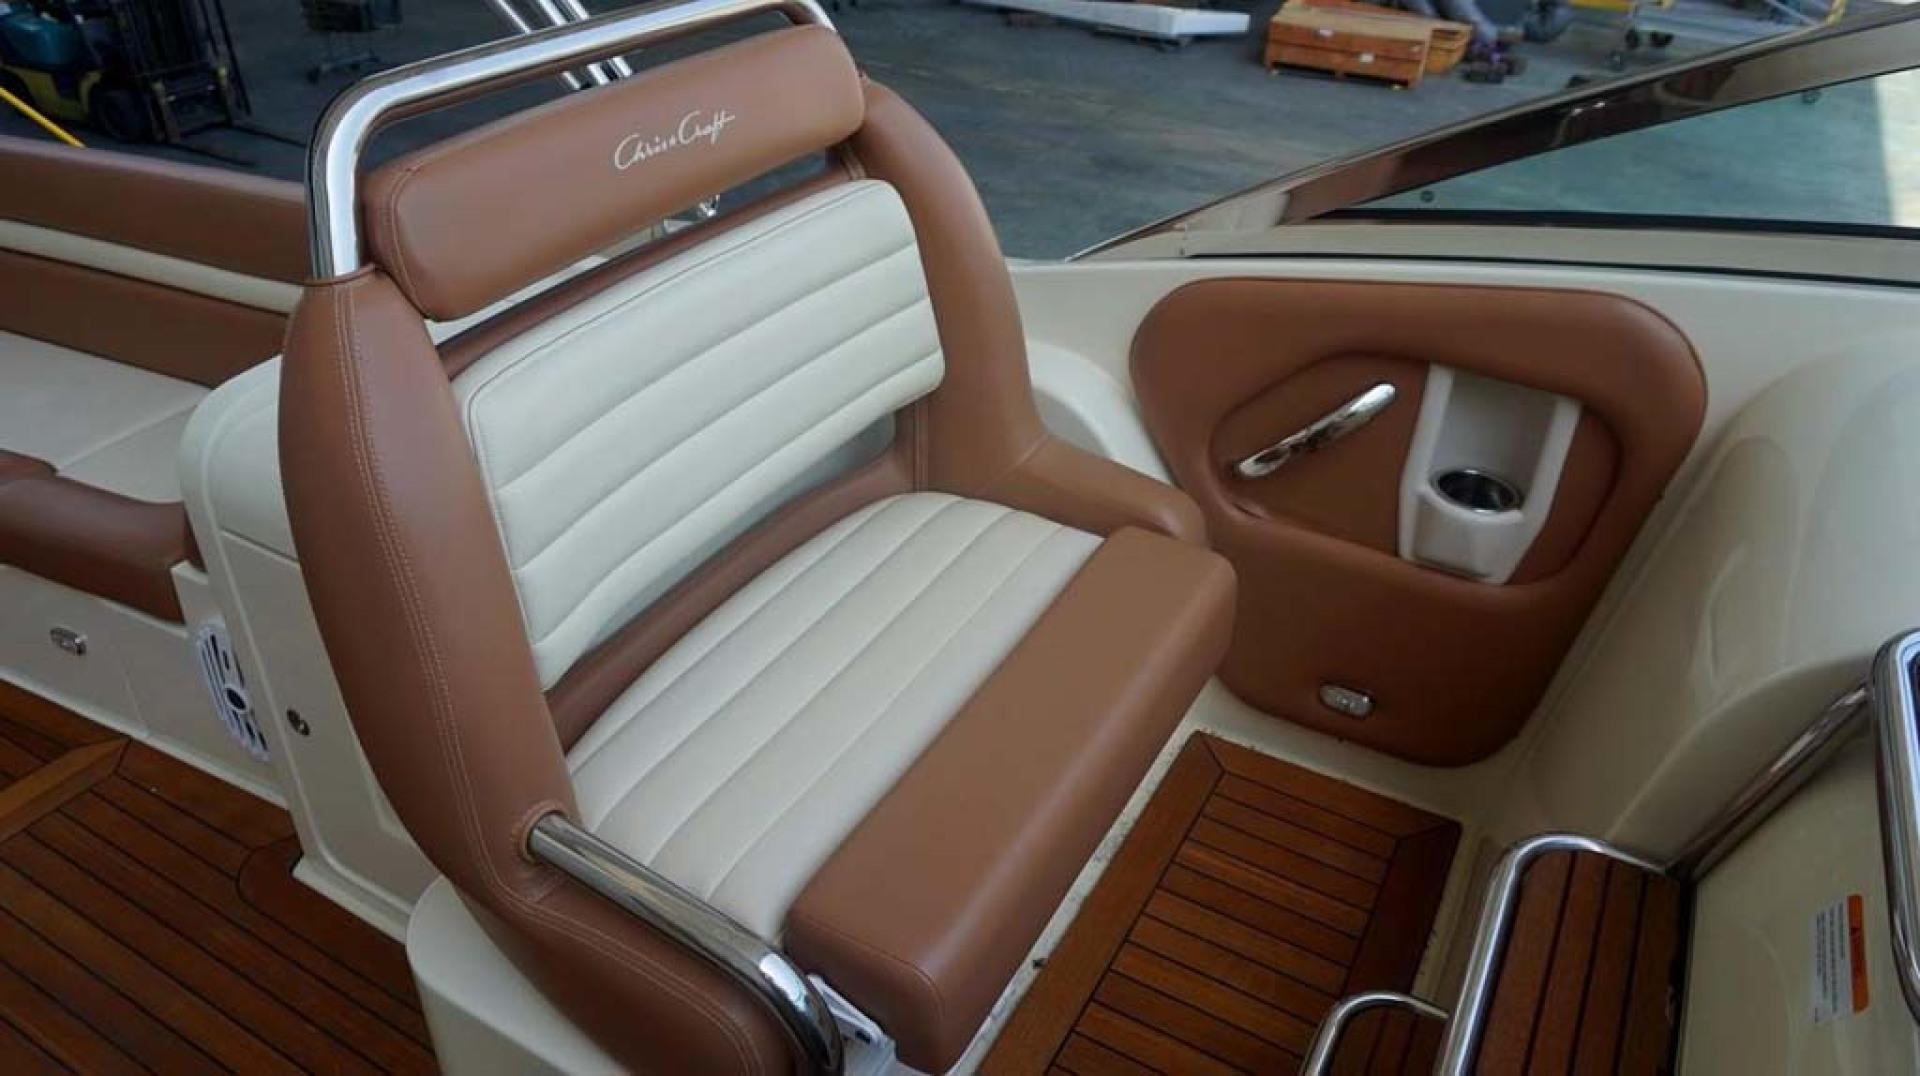 Chris-Craft-Corsair 36 2013-La Dolce Vita Fort Lauderdale-Florida-United States-Companion Seat-1074564 | Thumbnail